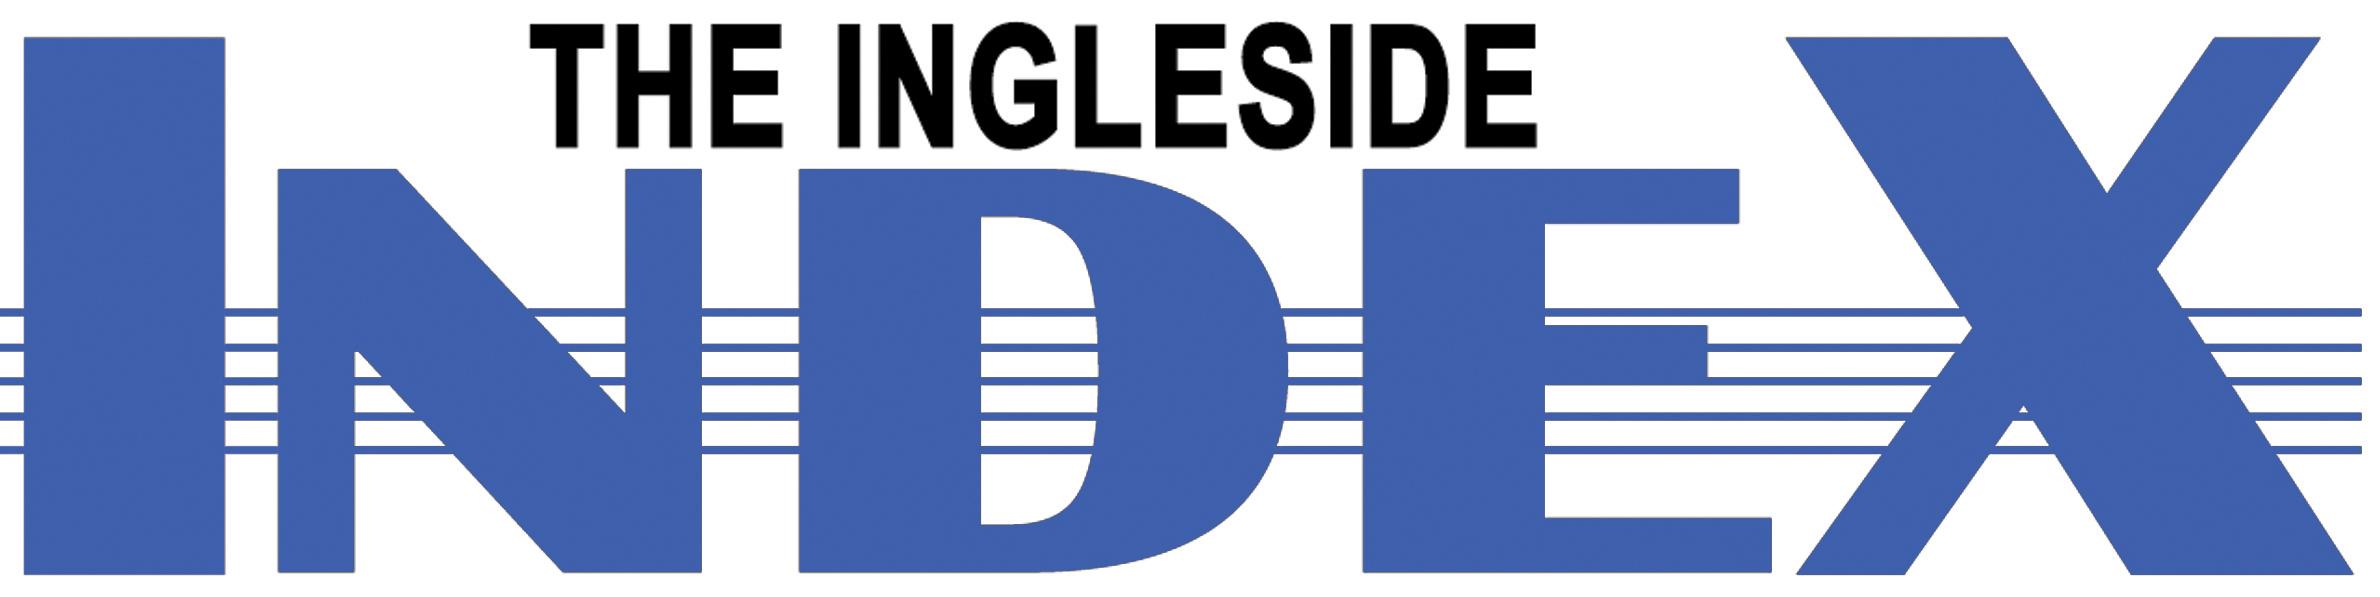 The Ingleside Index